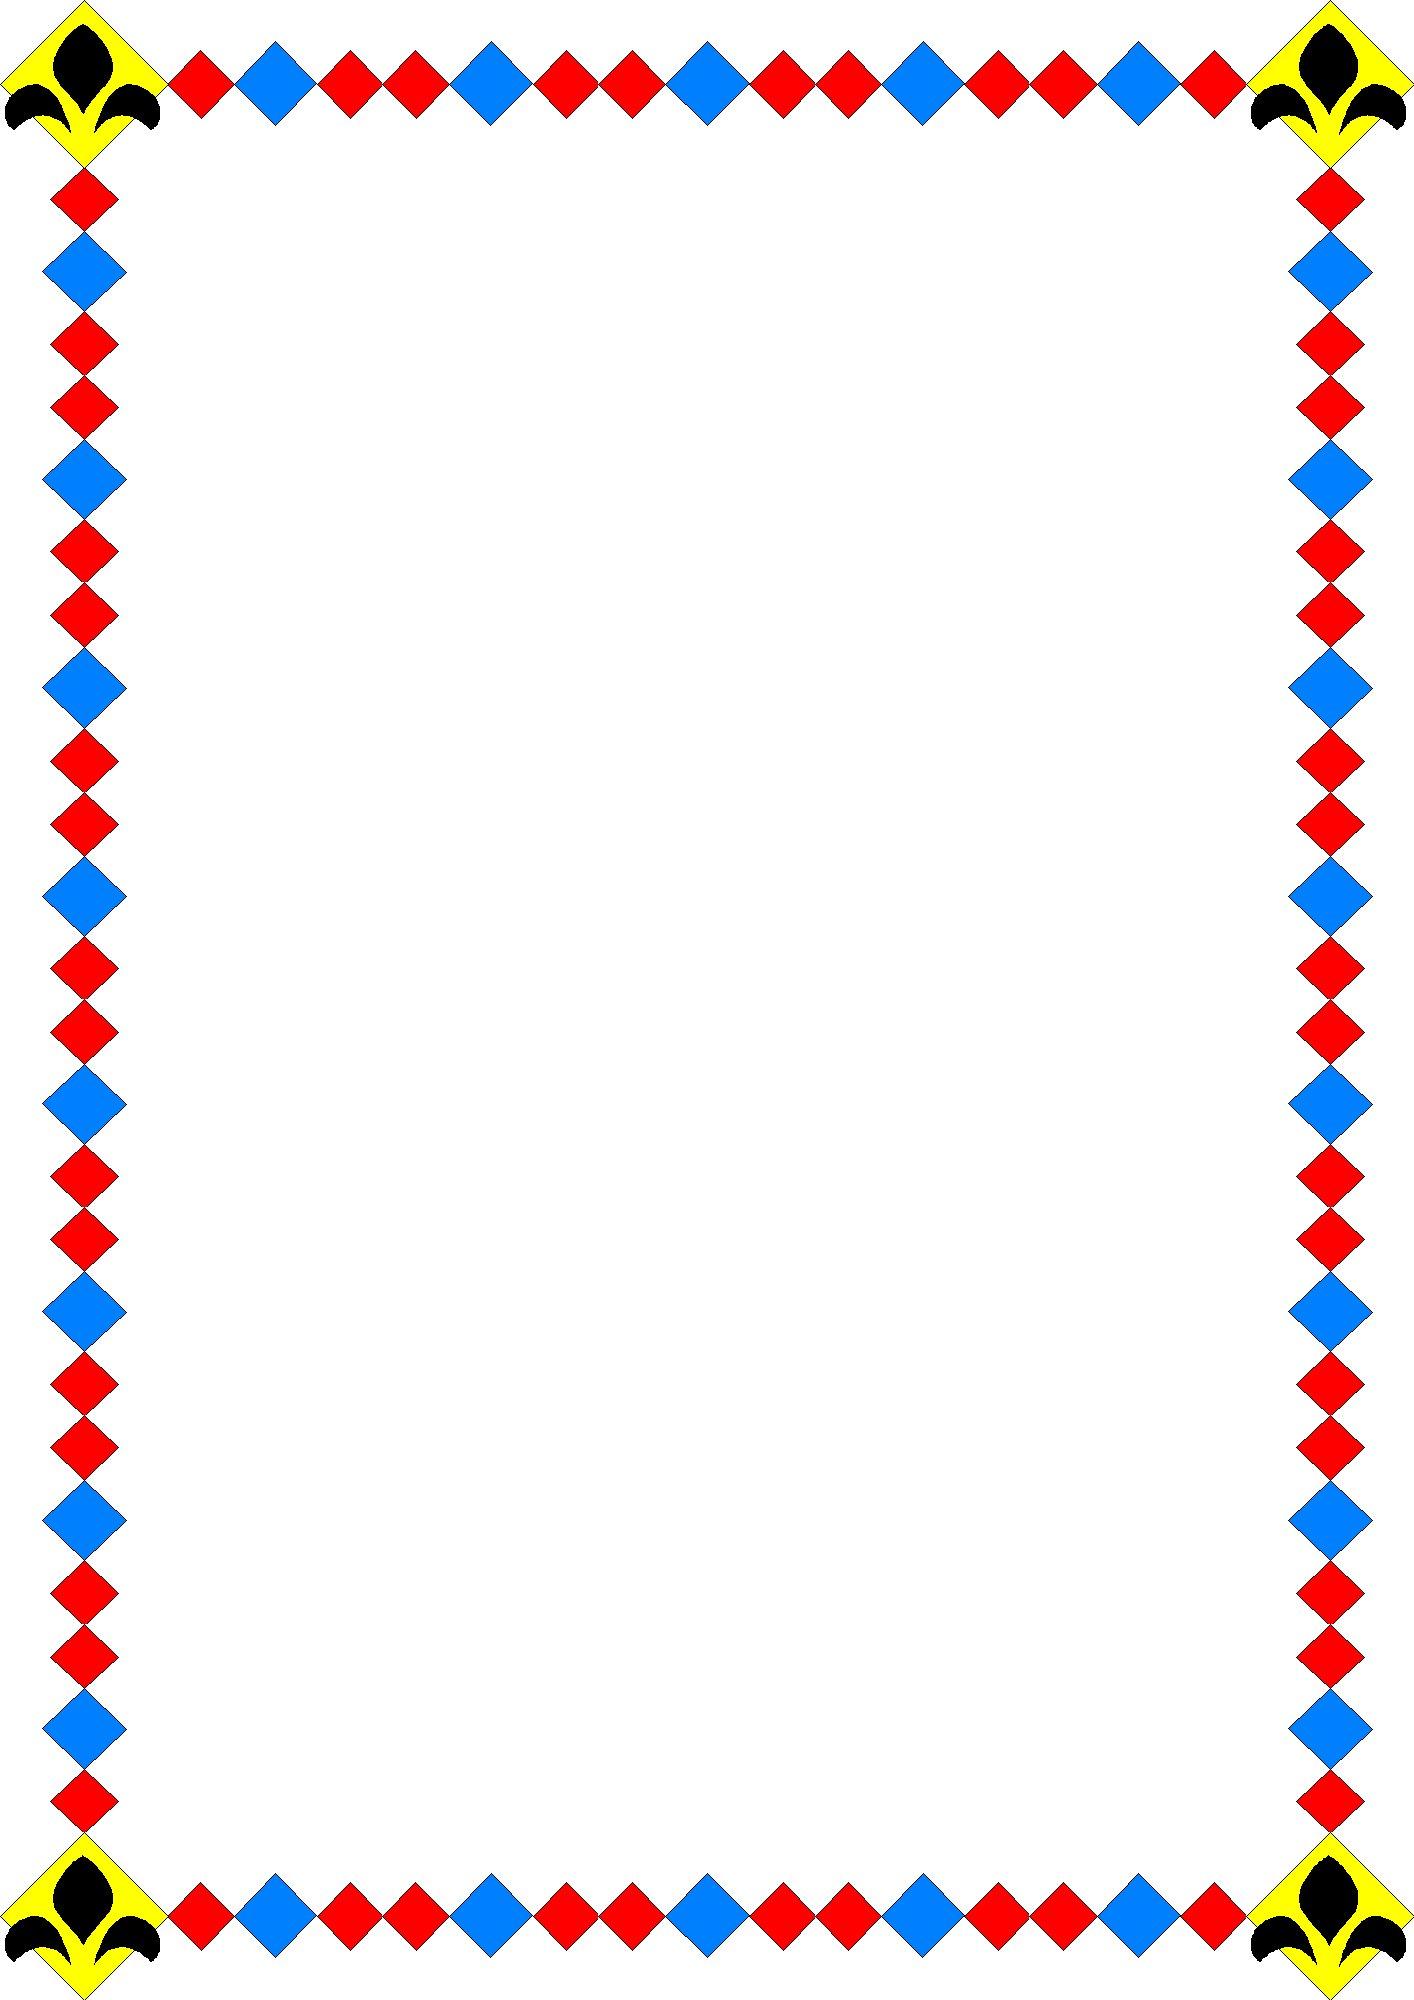 clip art borders frames download - photo #15